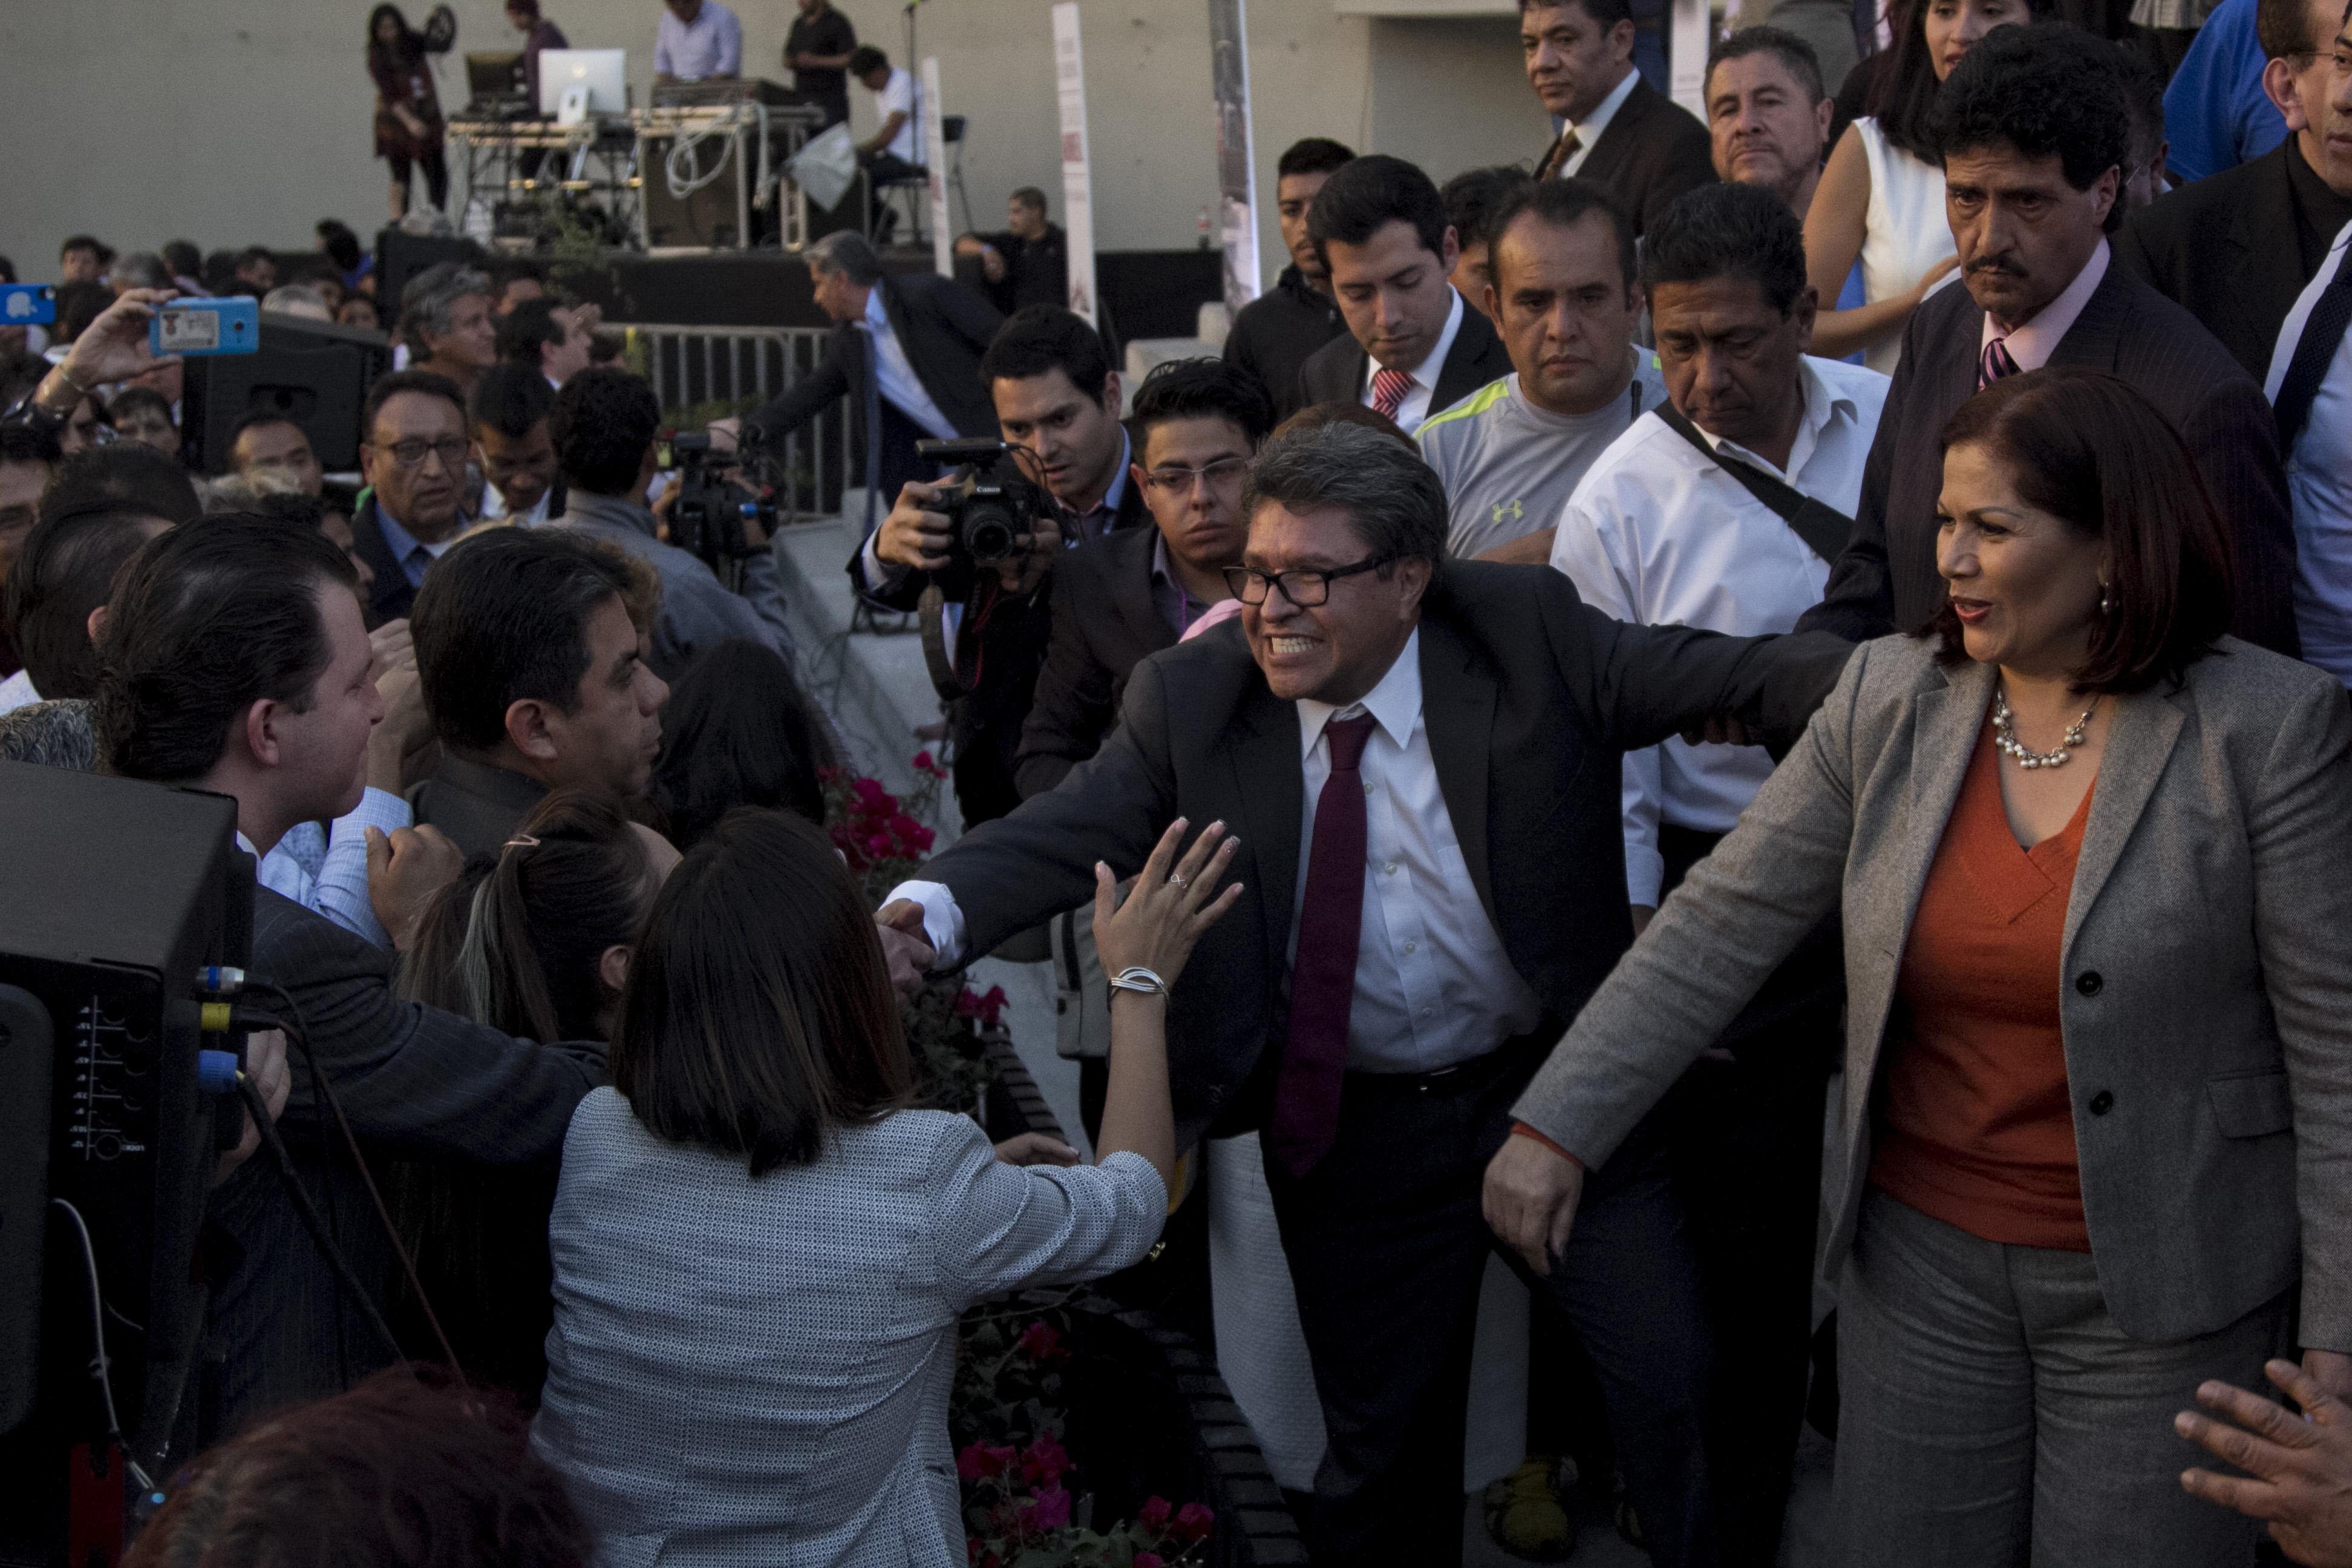 Ricardo Monreal, jefe delegacional en Cuauhtémoc. FOTO: GALO CAÑAS /CUARTOSCURO.COM